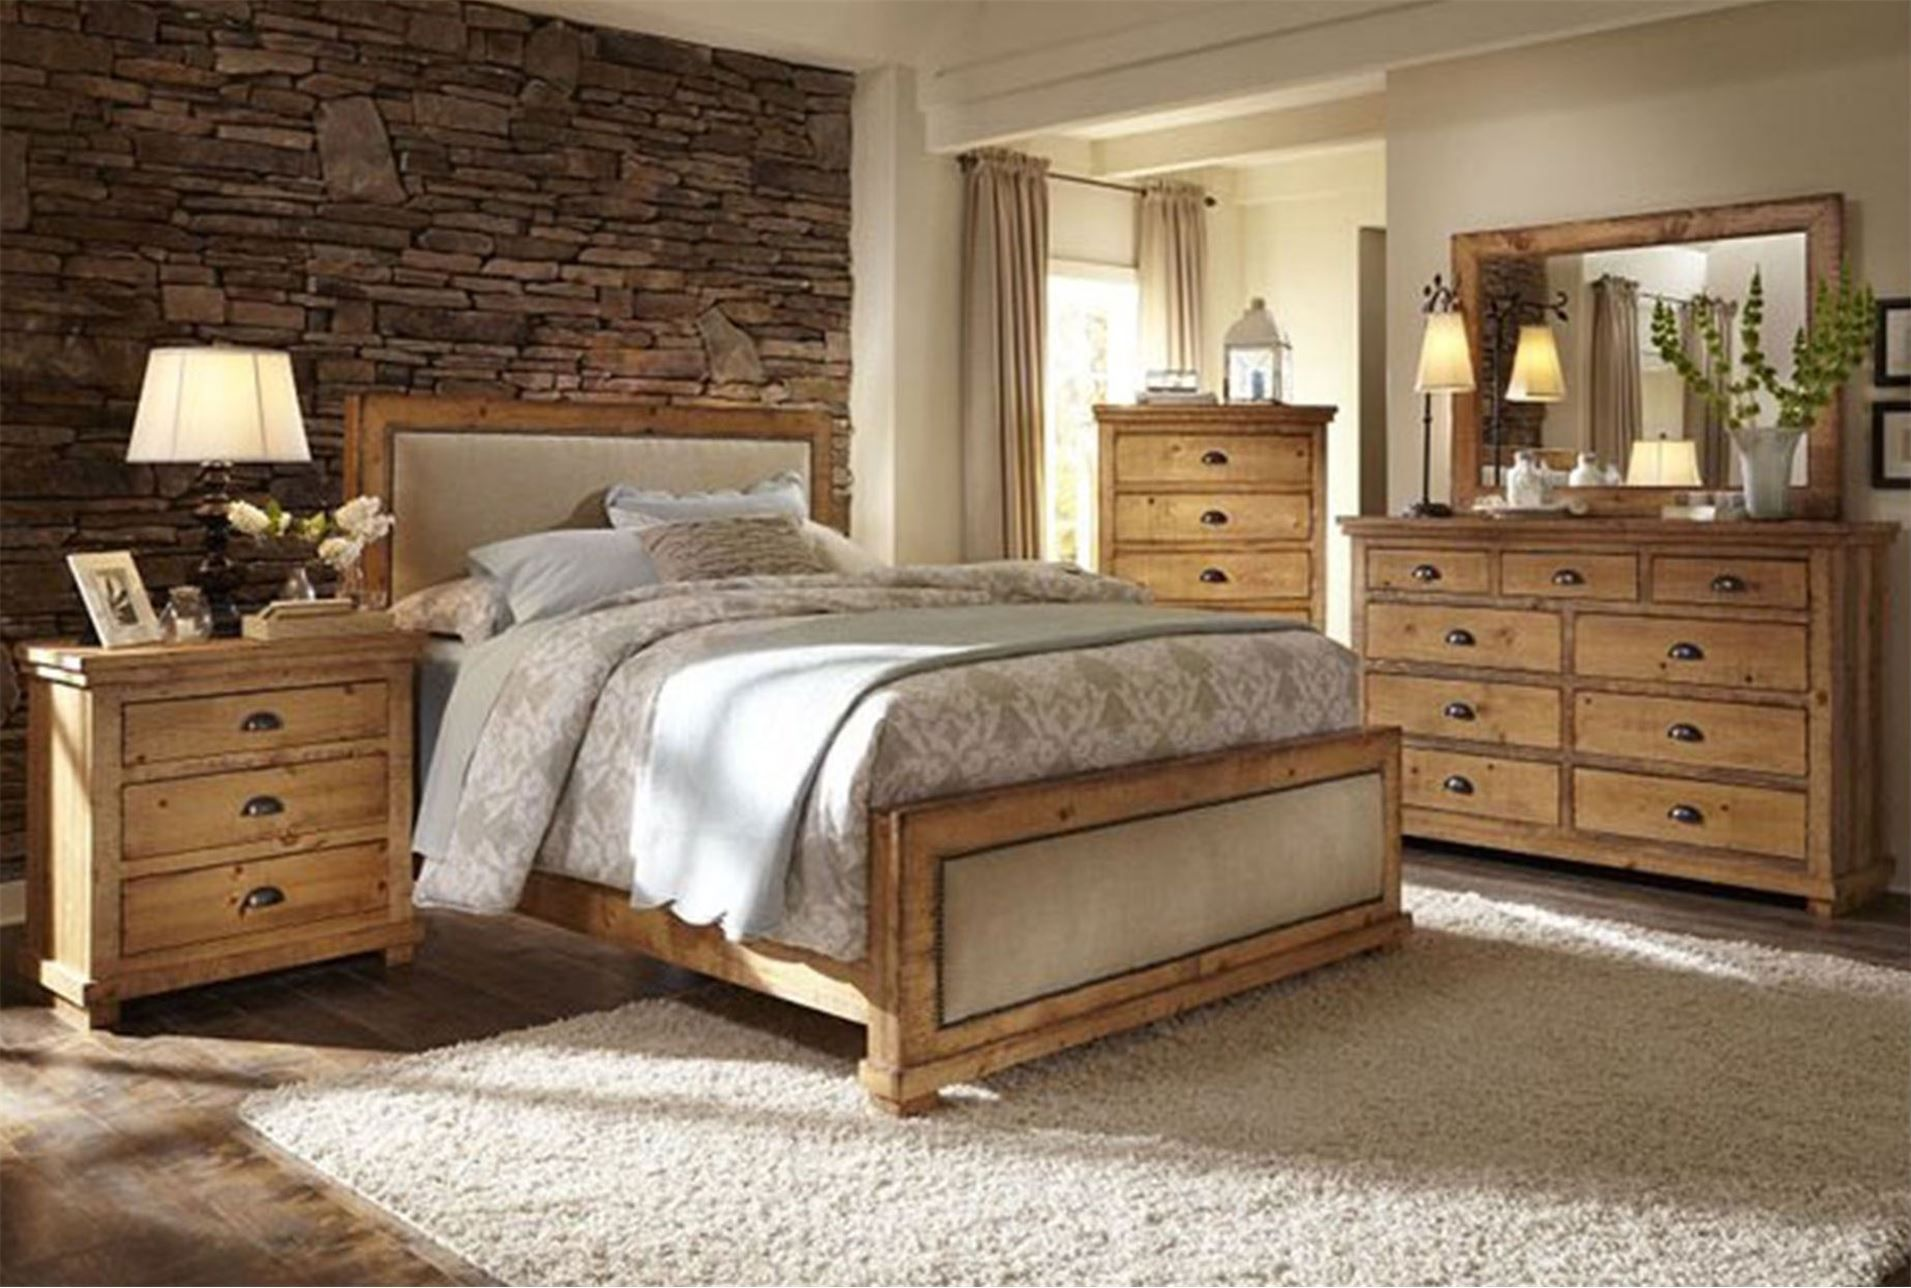 Sinclair pine california king panel bed master bedroom